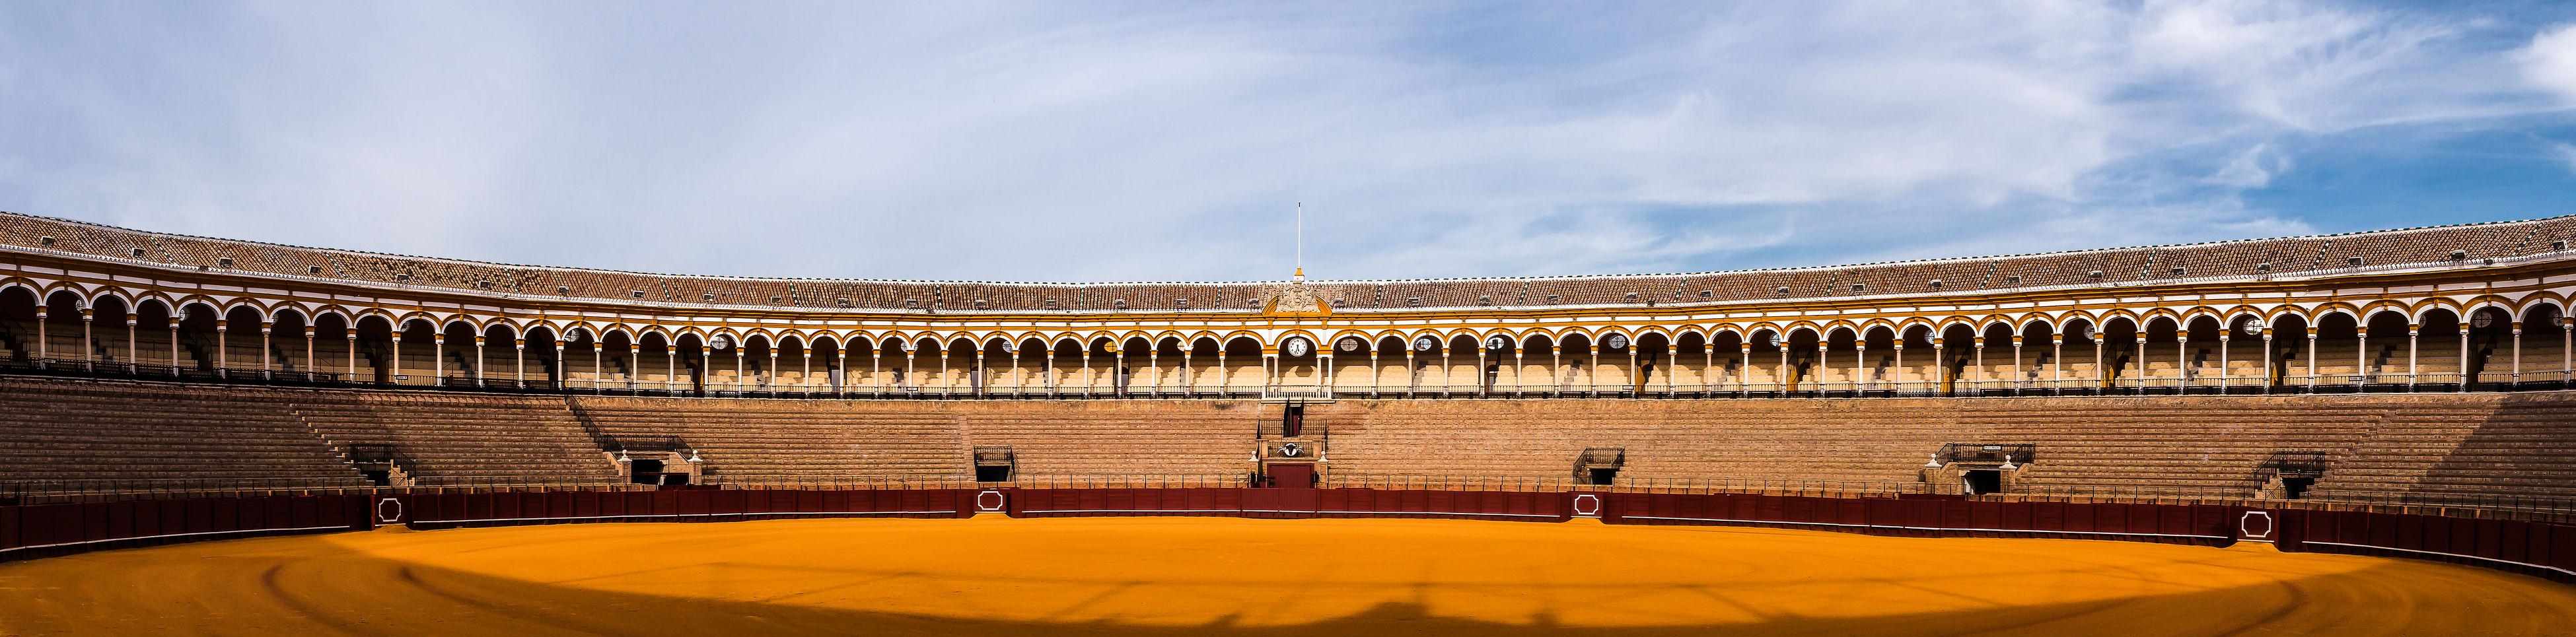 Andalucía Archtecture Bullfight Arena Corrida Panorama Panoramic Photography Sevilla Showcase July SPAIN Teatro De La Maestranza Travel Destinations Travel Photography